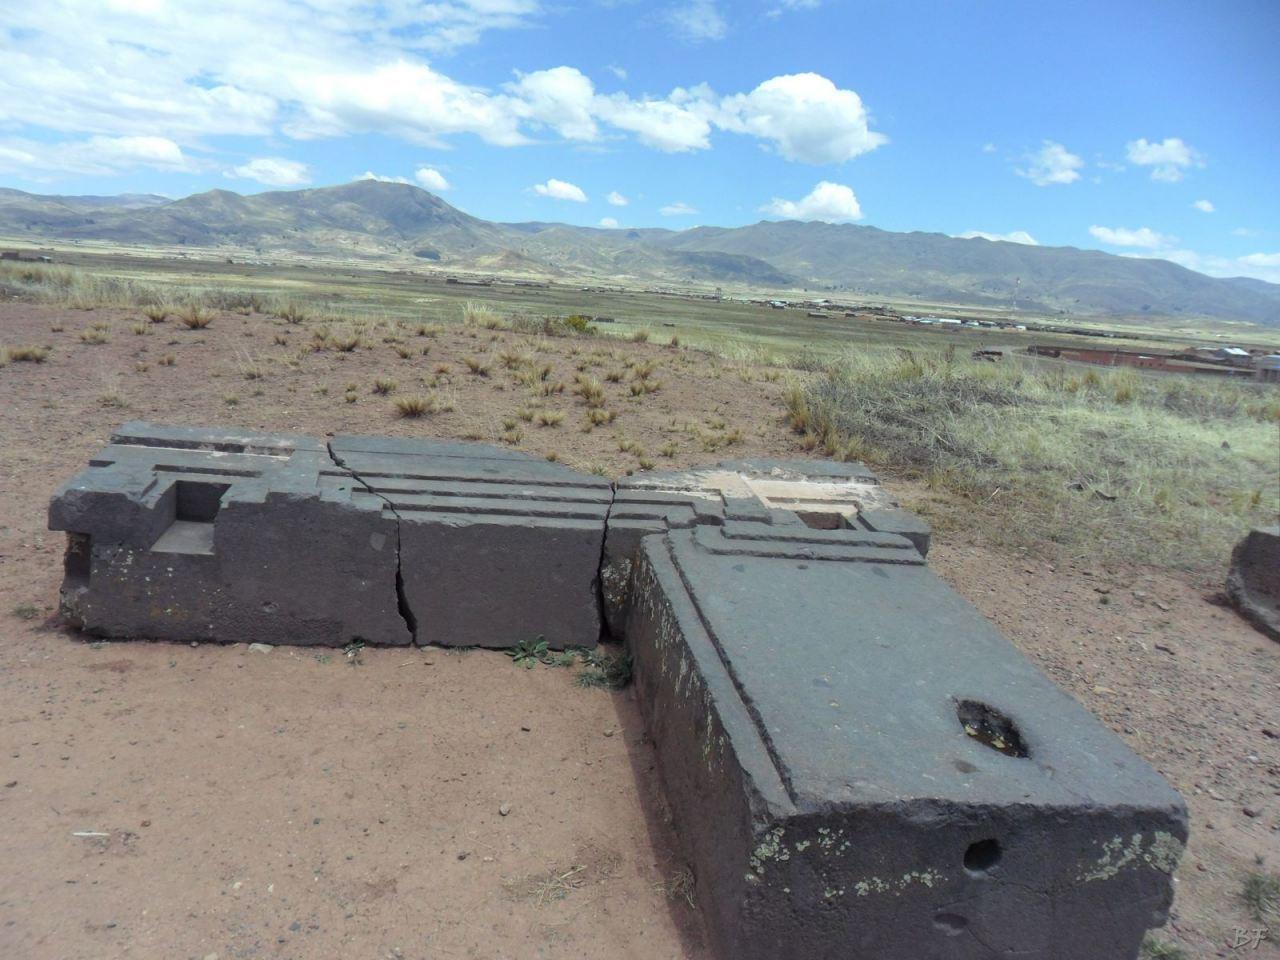 Sito-Megalitico-Piramide-Akapana-Kalasasaya-Menhir-Tiahuanaco-Bolivia-136